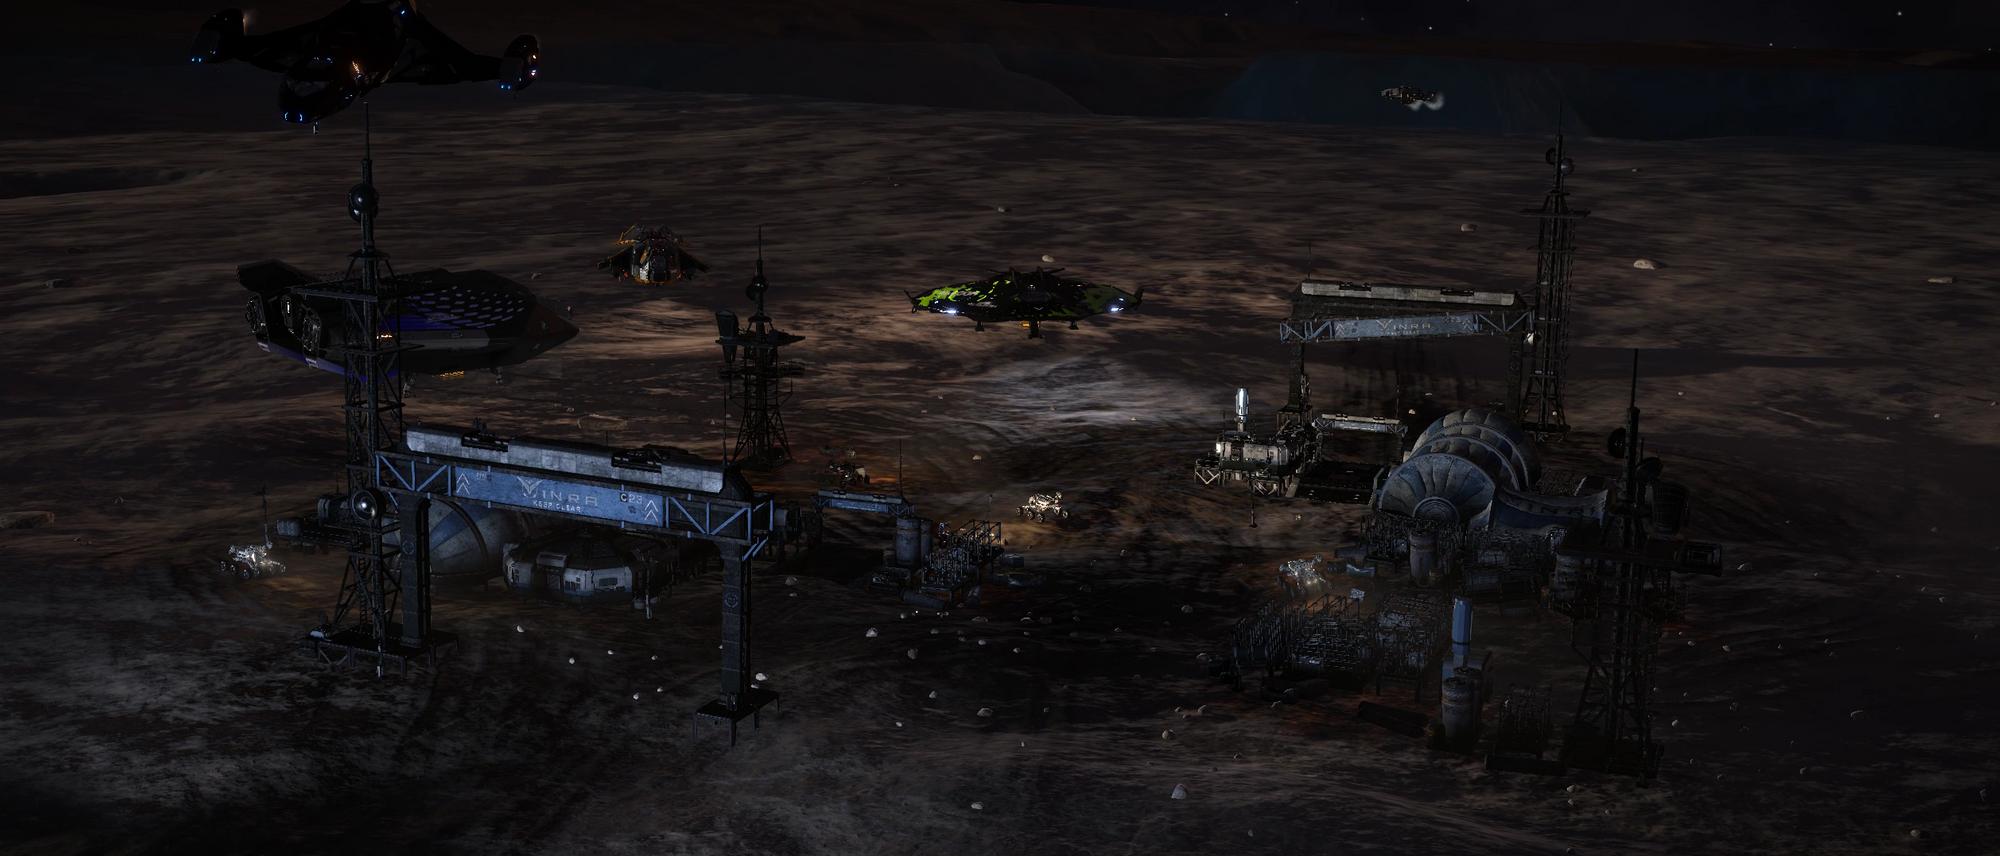 Sifting through an INRA base